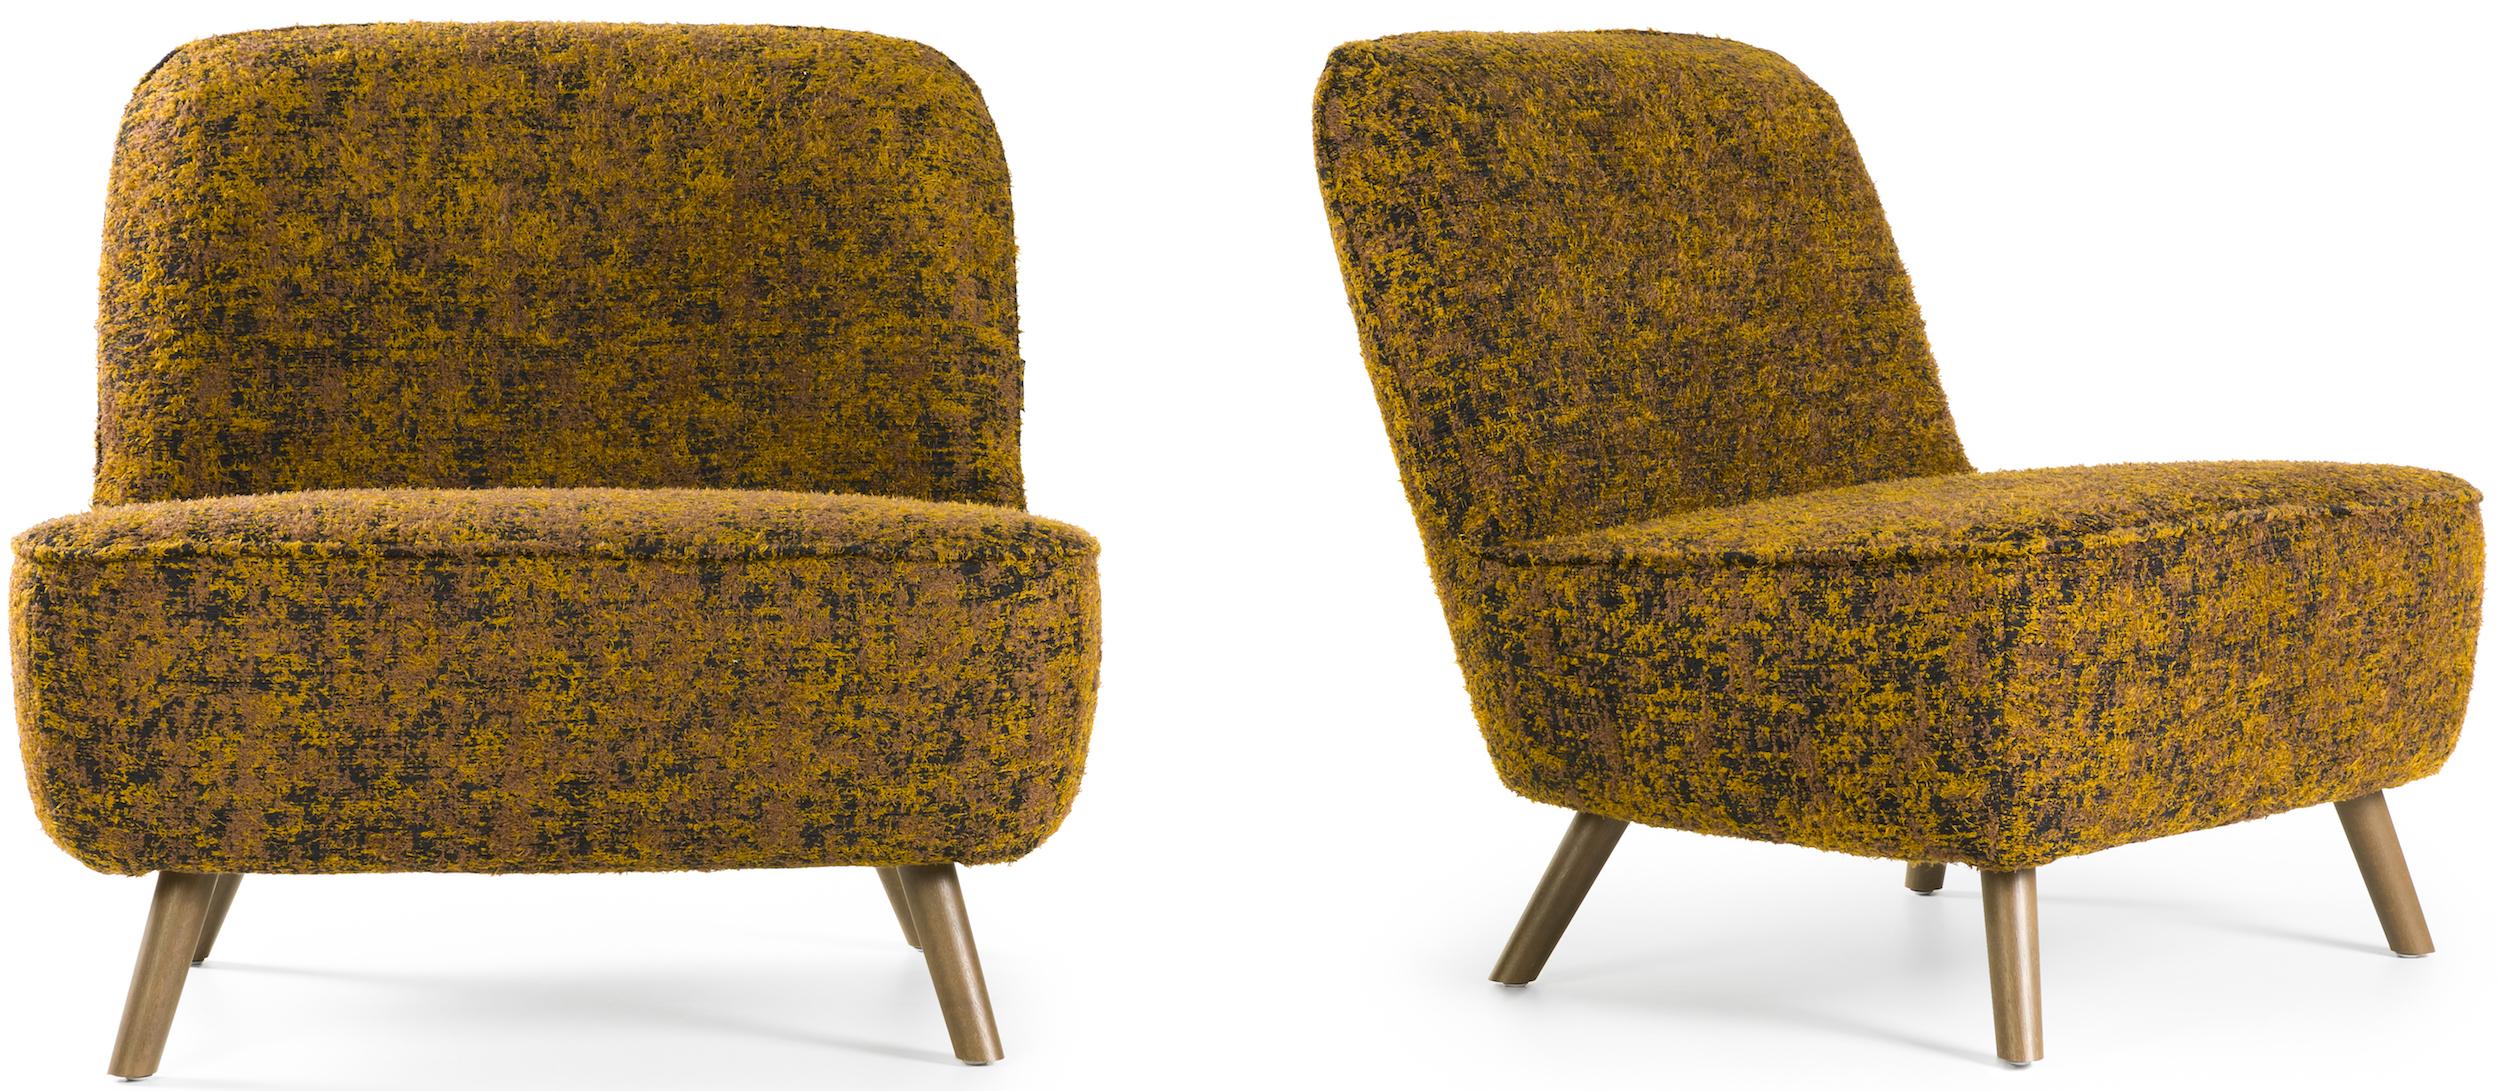 moooi – Cocktail Chair – design Marcel Wanders, 2013